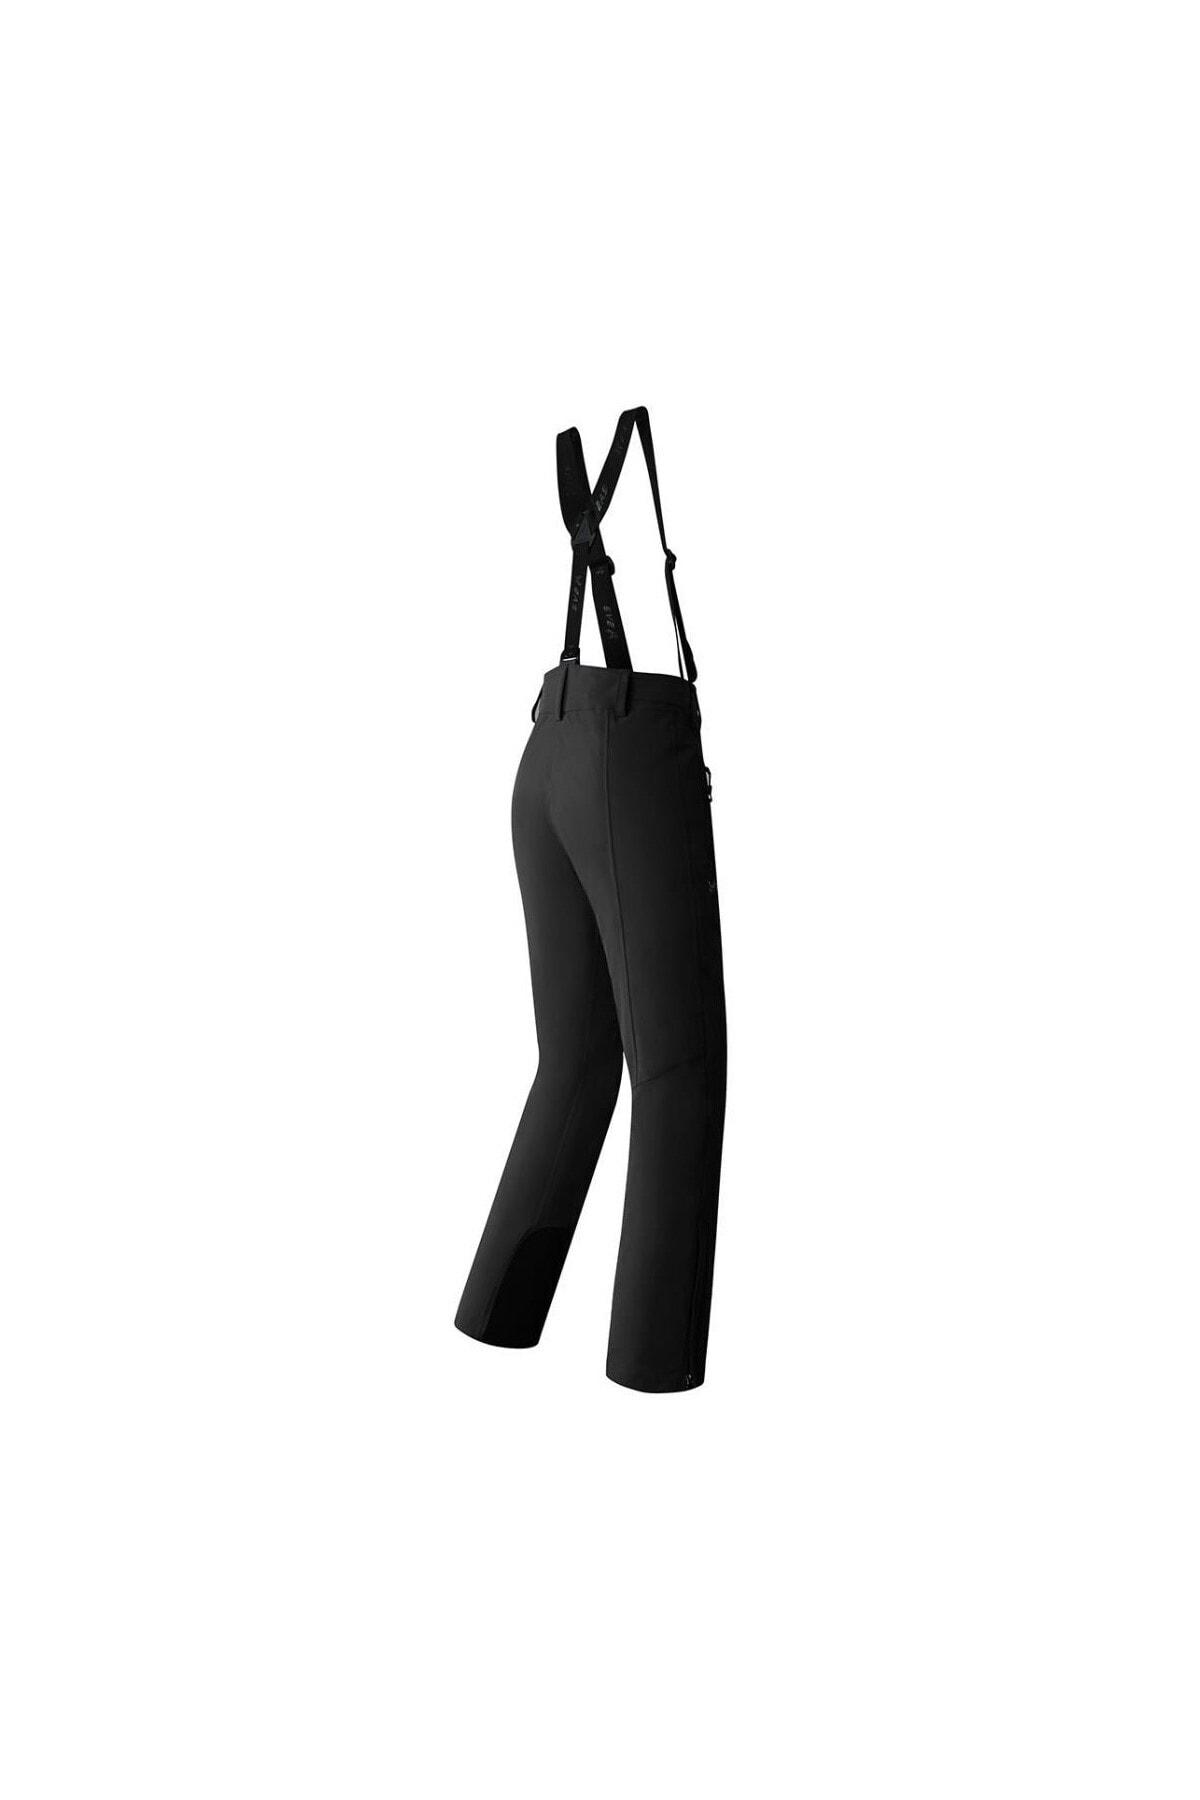 2AS Asama Kadın Kayak Pantalonu 2